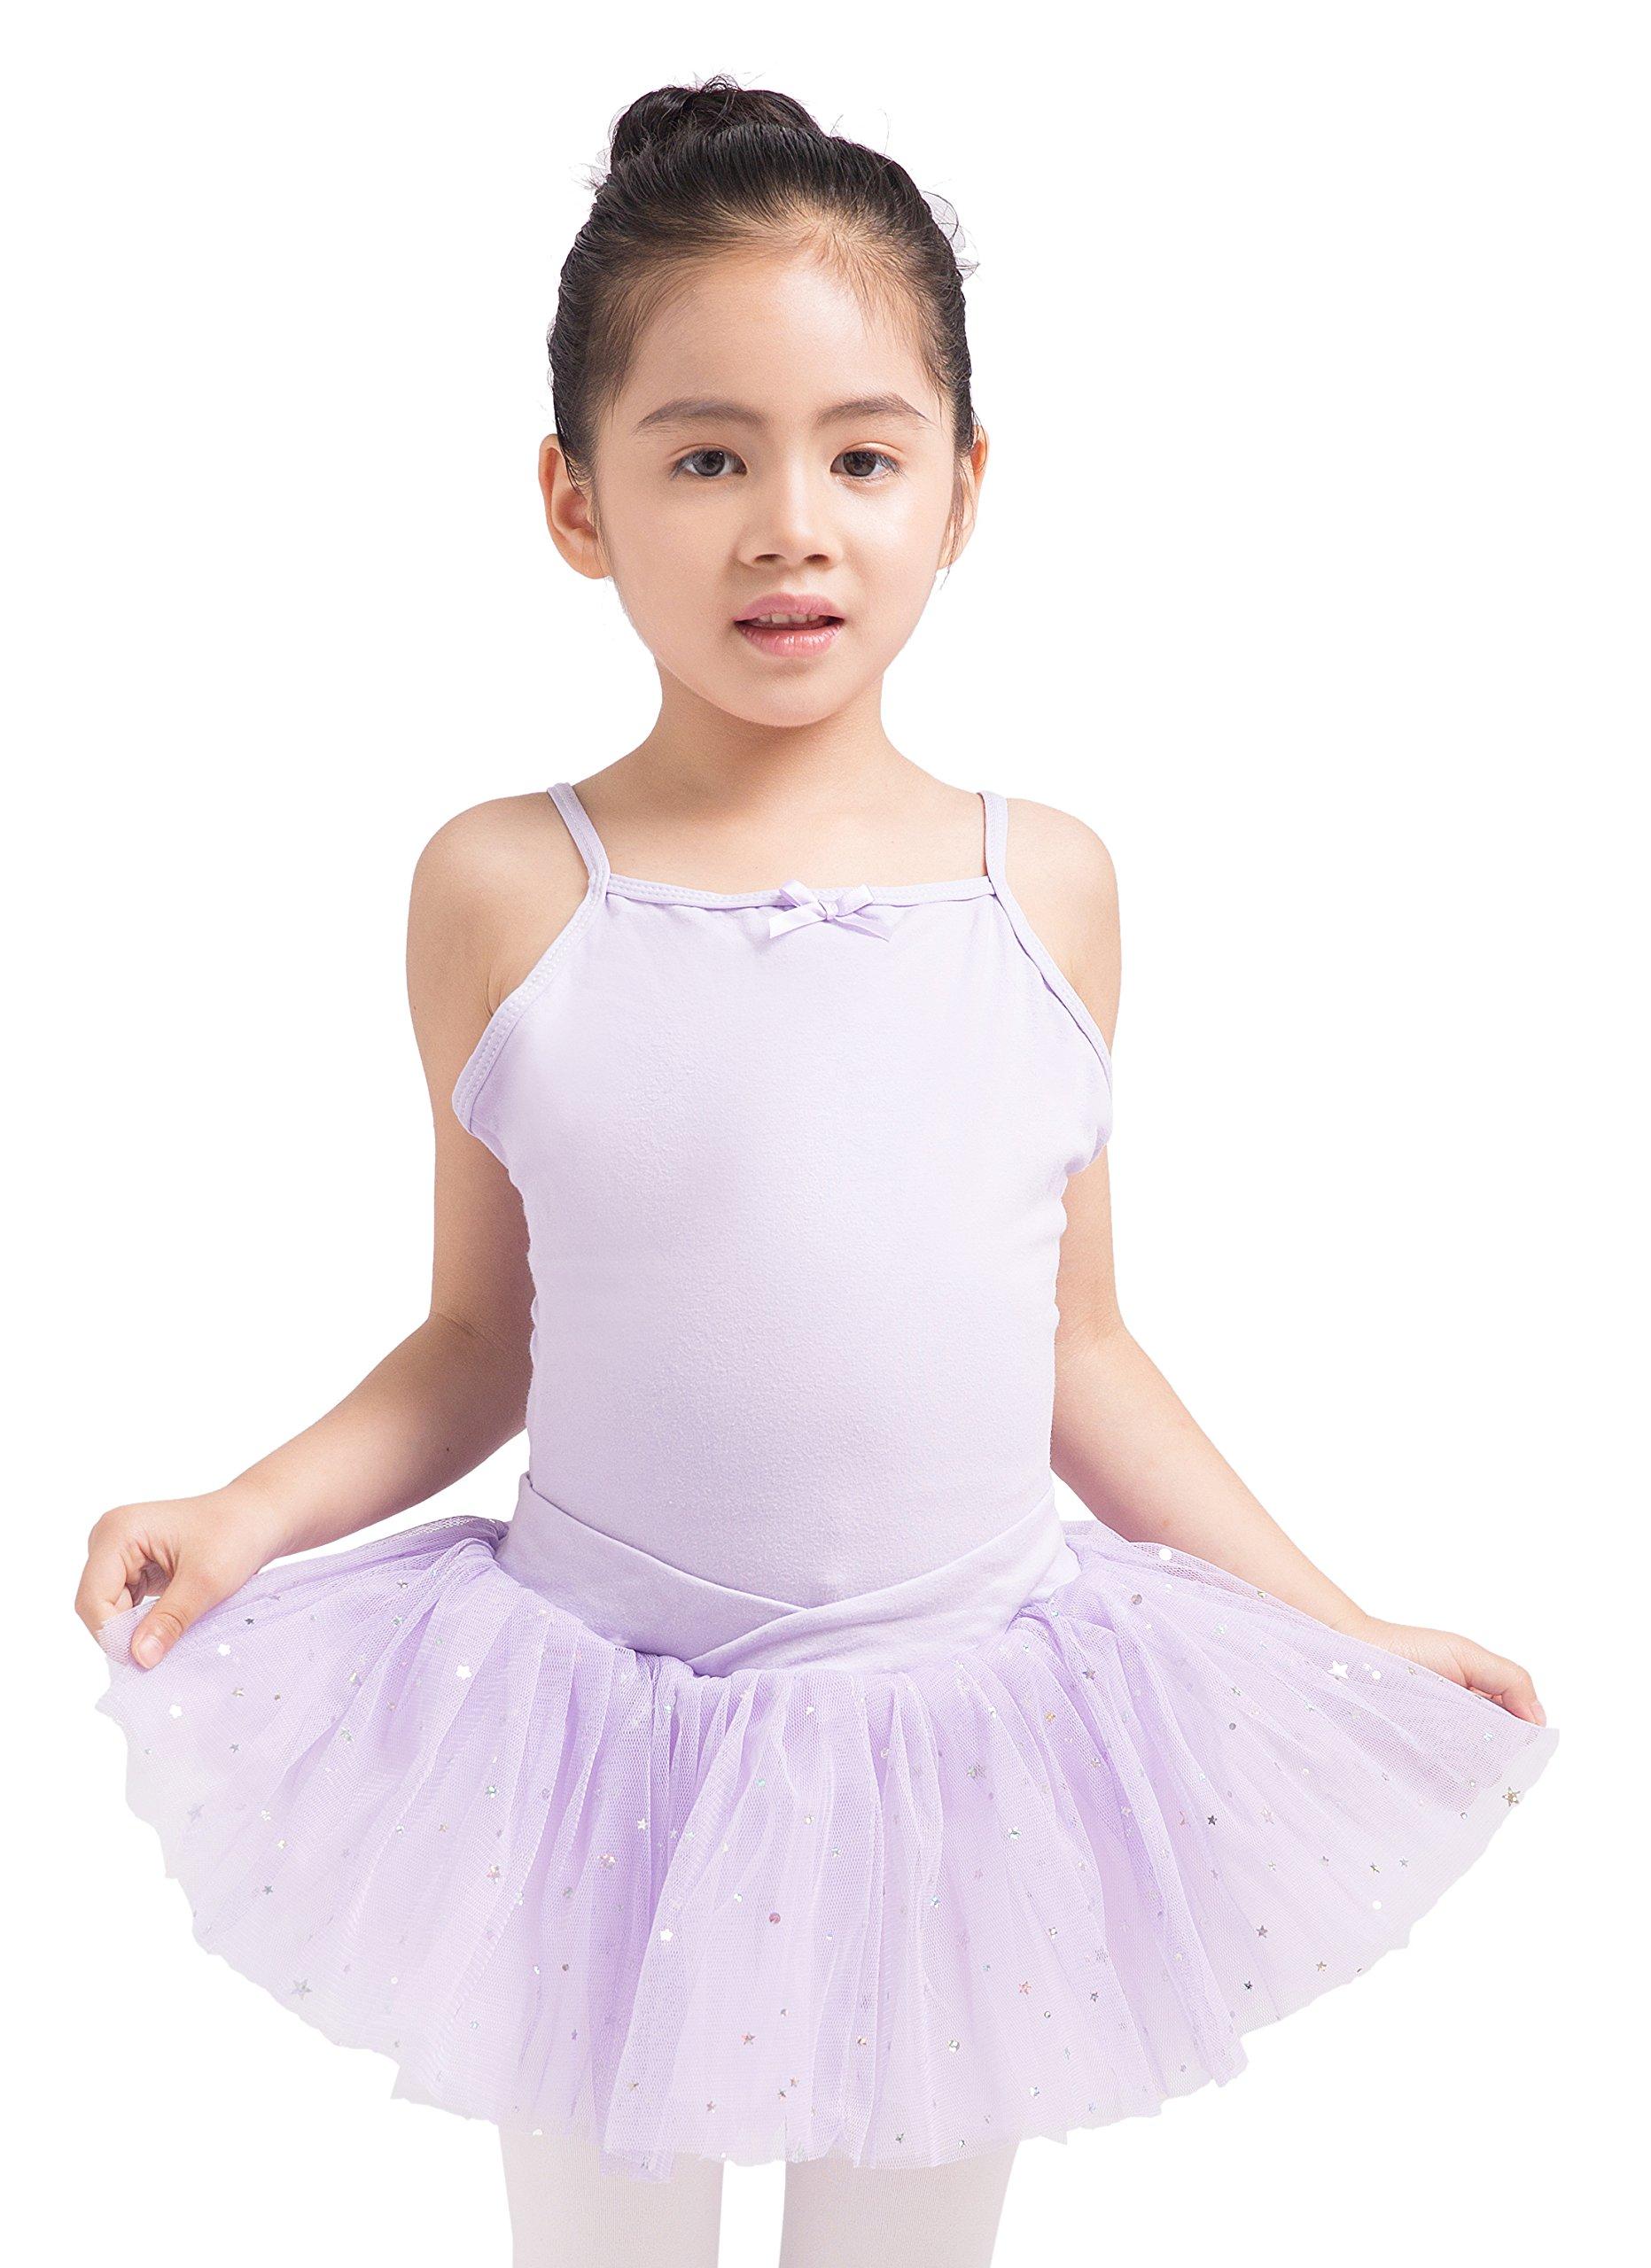 Dancina Leotard Camisole Ballet Tutu Dress Future Ballerina Dance Class Birthday Gift Outfit 4 Lavender